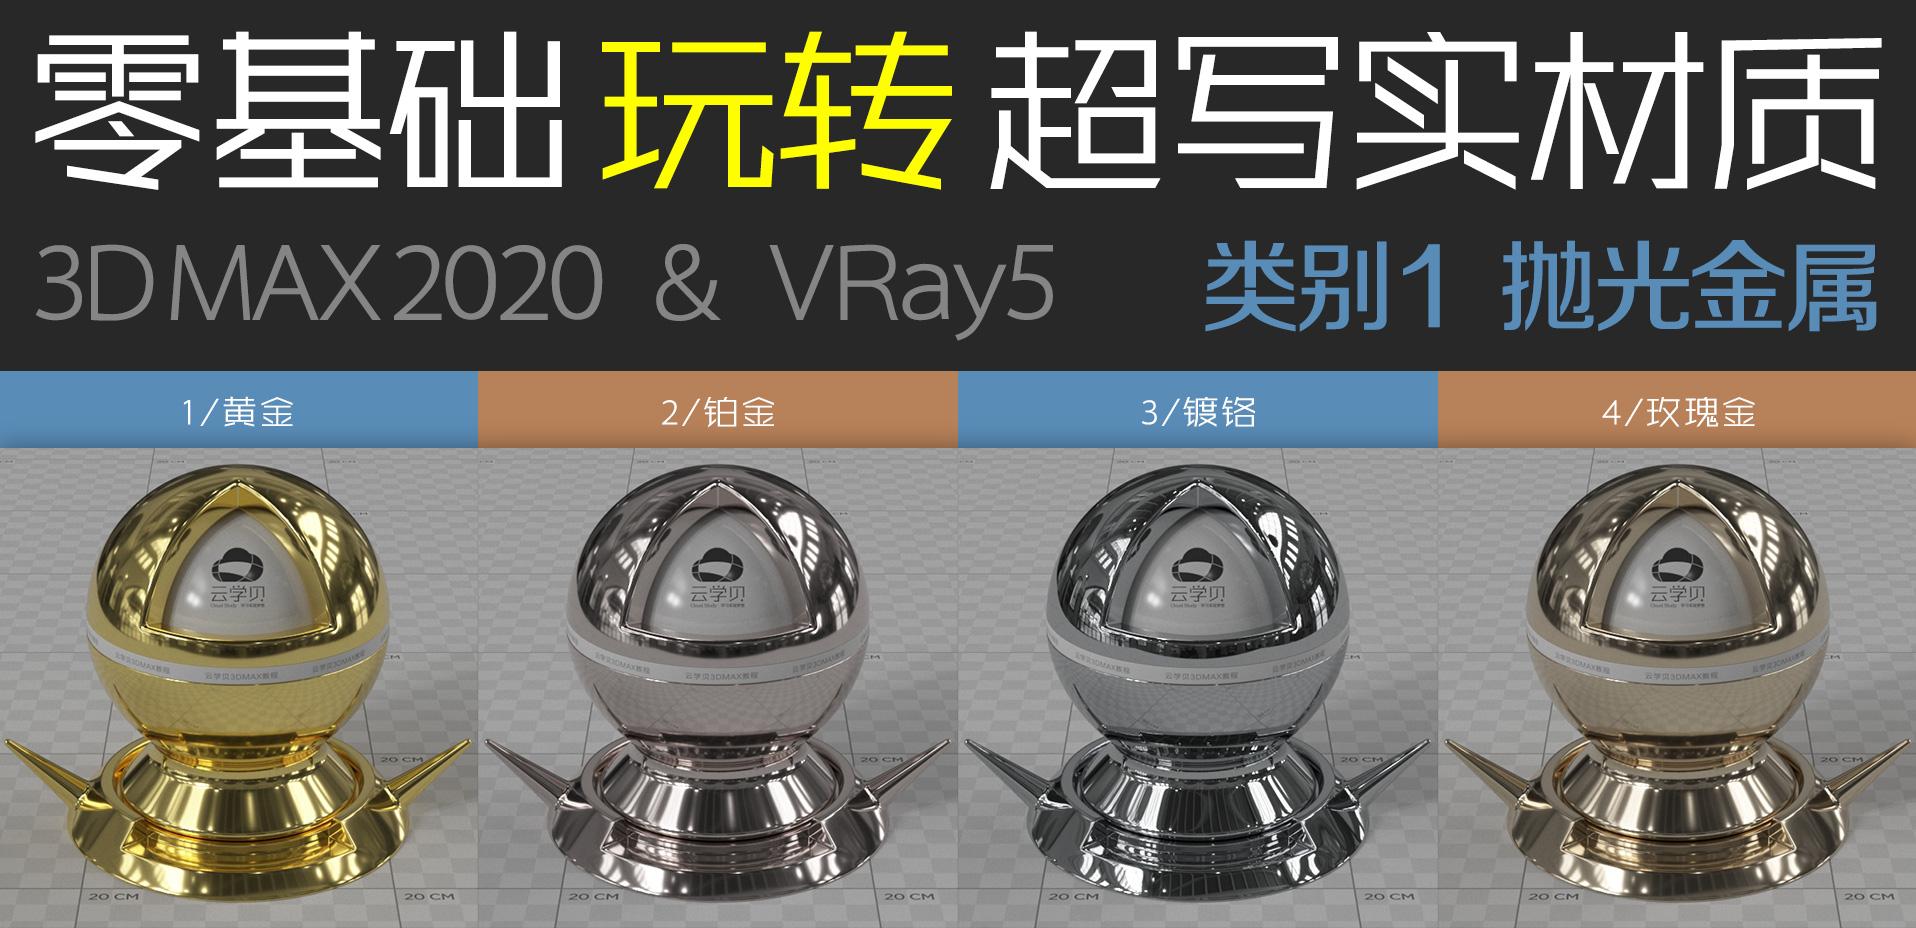 2020VRay5材质教程1.jpg